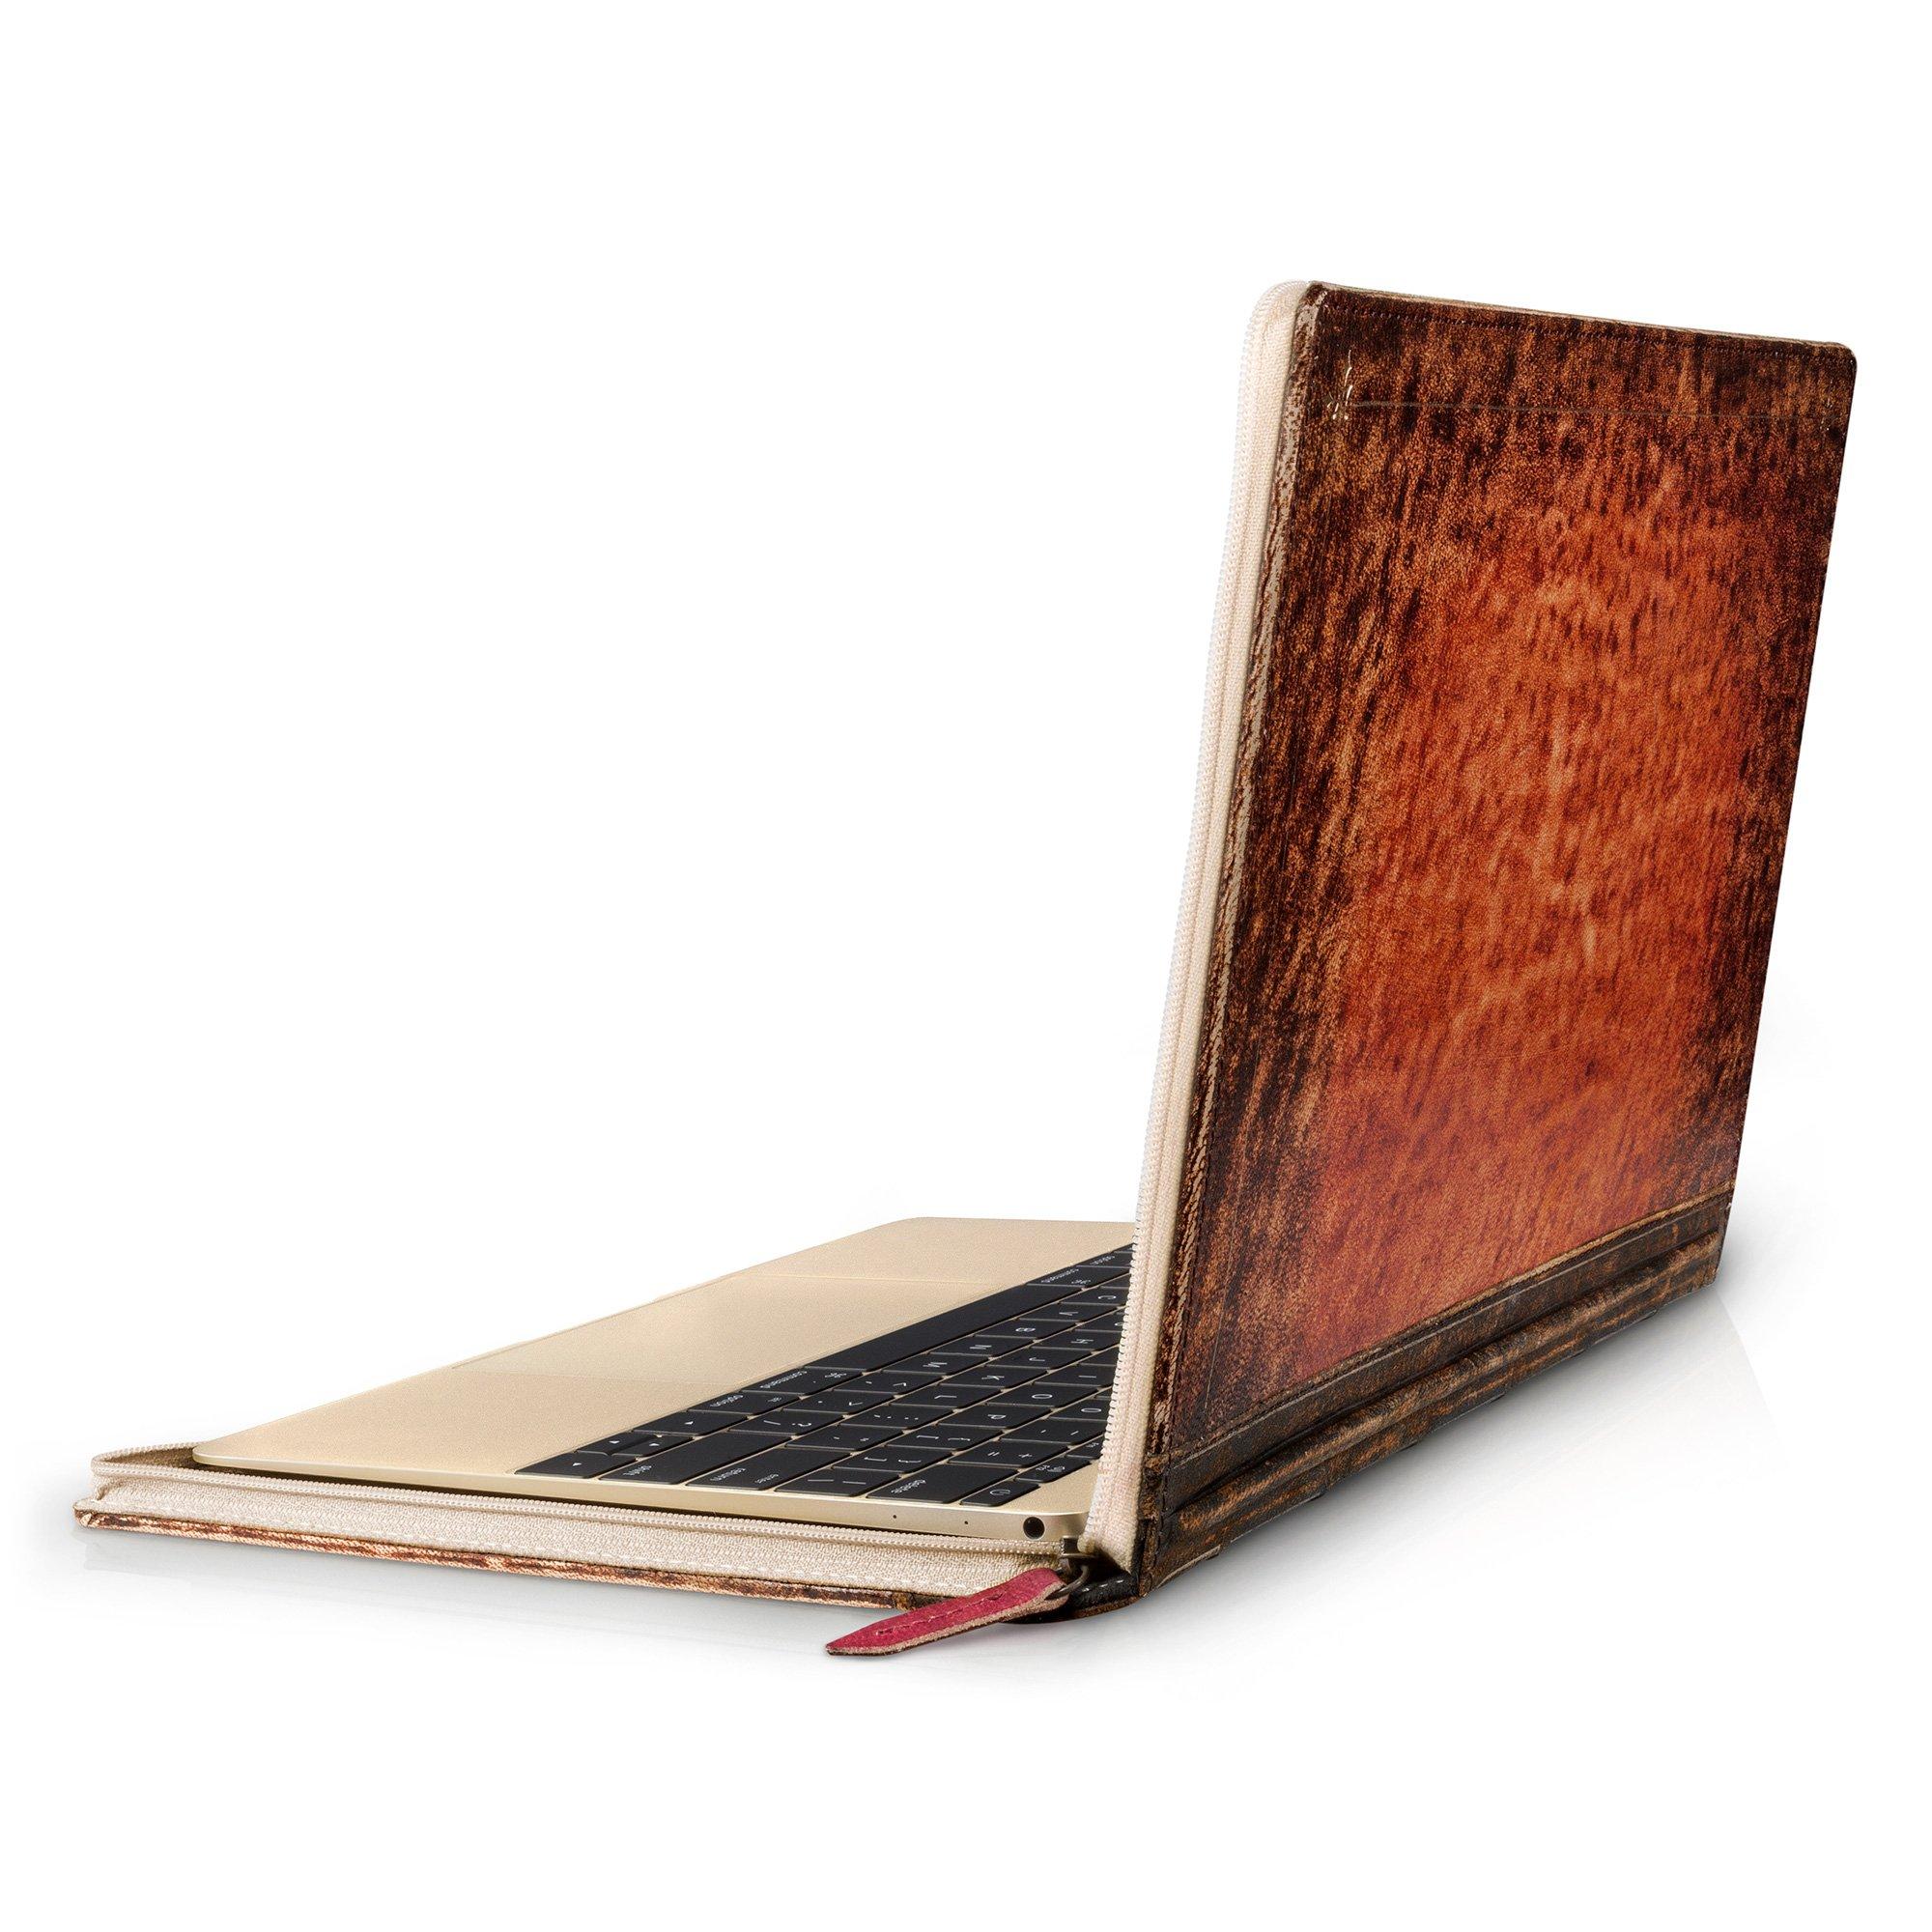 Twelve South Rutledge BookBook for MacBook | Artisan leather book case/sleeve for 12-inch MacBook